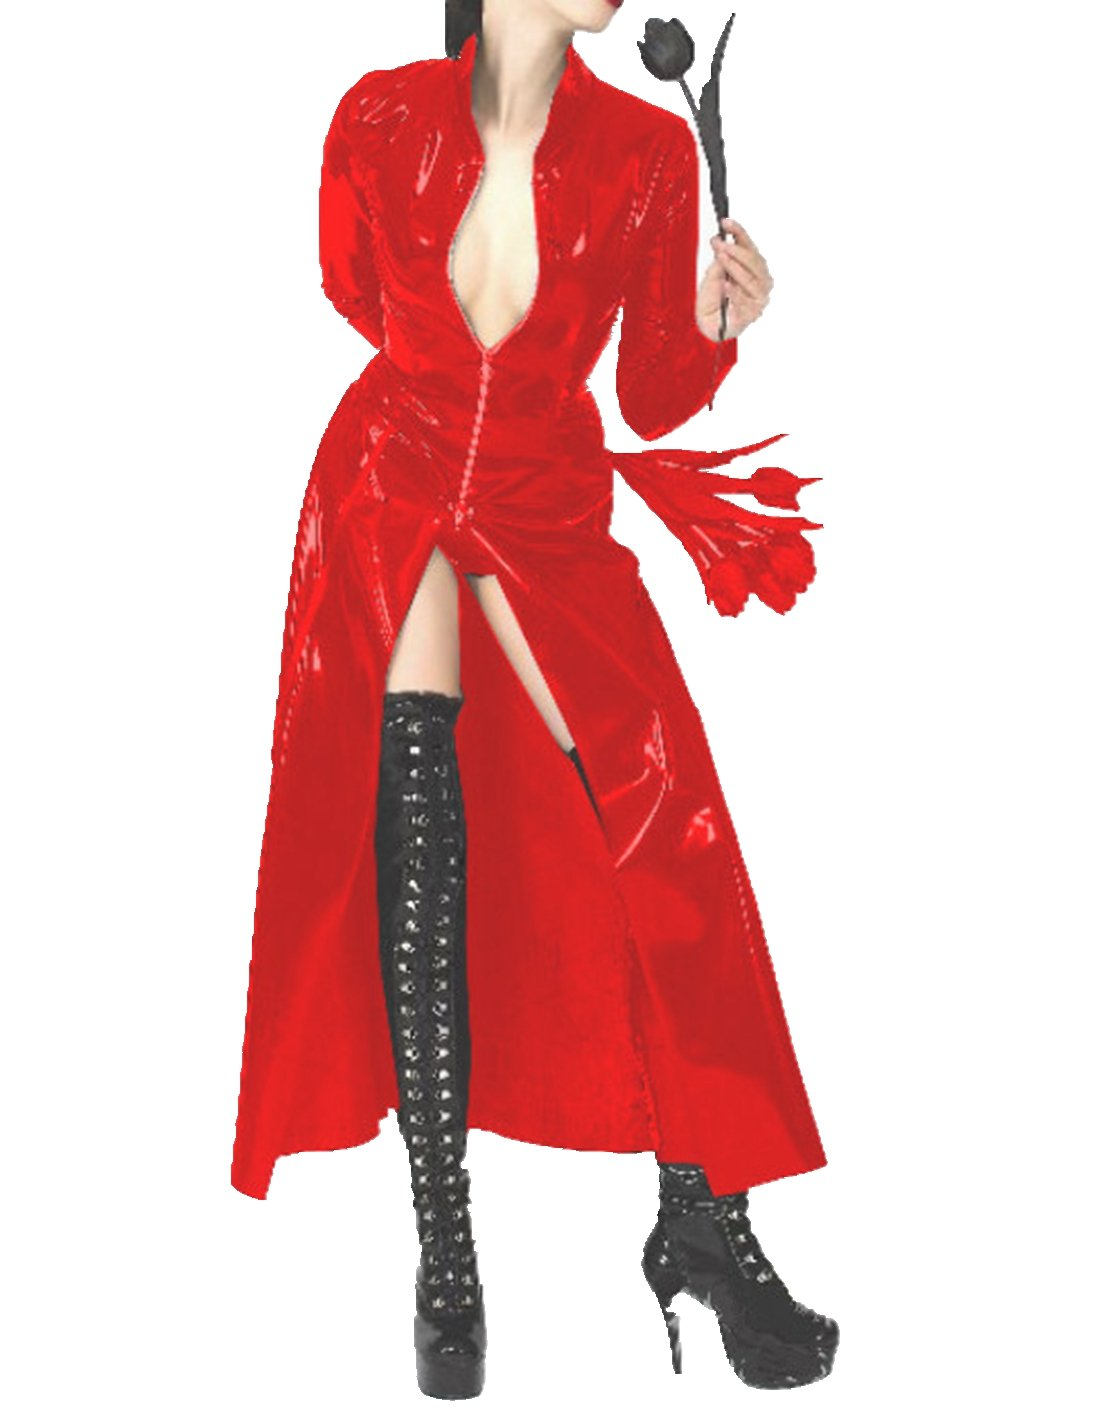 CHICTRY Women/Man's Shiny Metallic Leather Turtleneck Trench Coat Long Jacket Red X-Large